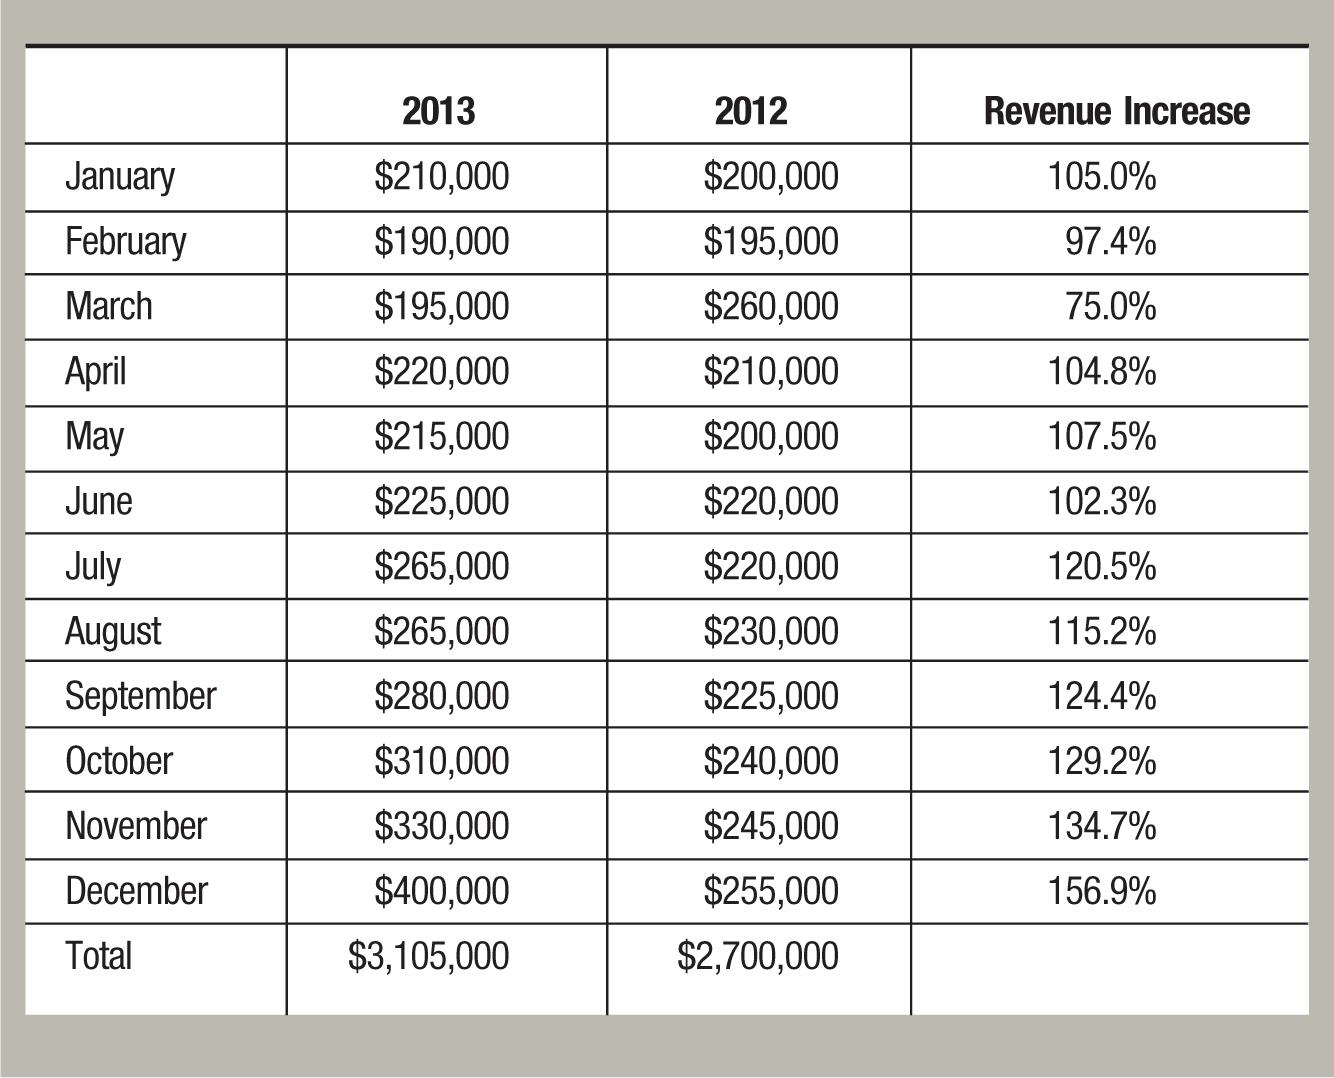 2013; 2012; Revenue Increase January; $210,000; $200,000; 105.0% February; $190,000; $195,000; 97.4% March; $195,000; $260,000; 75.0% April; $220,000; $210,000; 104.8% May; $215,000; $200,000; 107.5% June; $225,000; $220,000; 102.3% July; $265,000; $220,000; 120.5% August; $265,000; $230,000; 115.2% September; $280,000; $225,000; 124.4% October; $310,000; $240,000; 129.2% November; $330,000; $245,000; 134.7% December; $400,000; $255,000; 156.9% Total; $3,105,000; $2,700,000